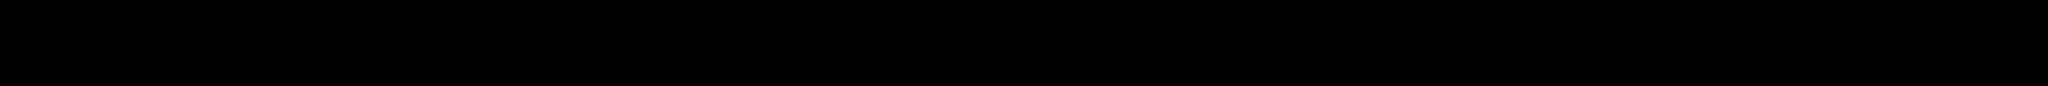 A.B.S. 1J0.411.315C, 00197, 1J0.411.315C, 1J0411315, 1J0 411 315C Rod / Strut, stabiliser